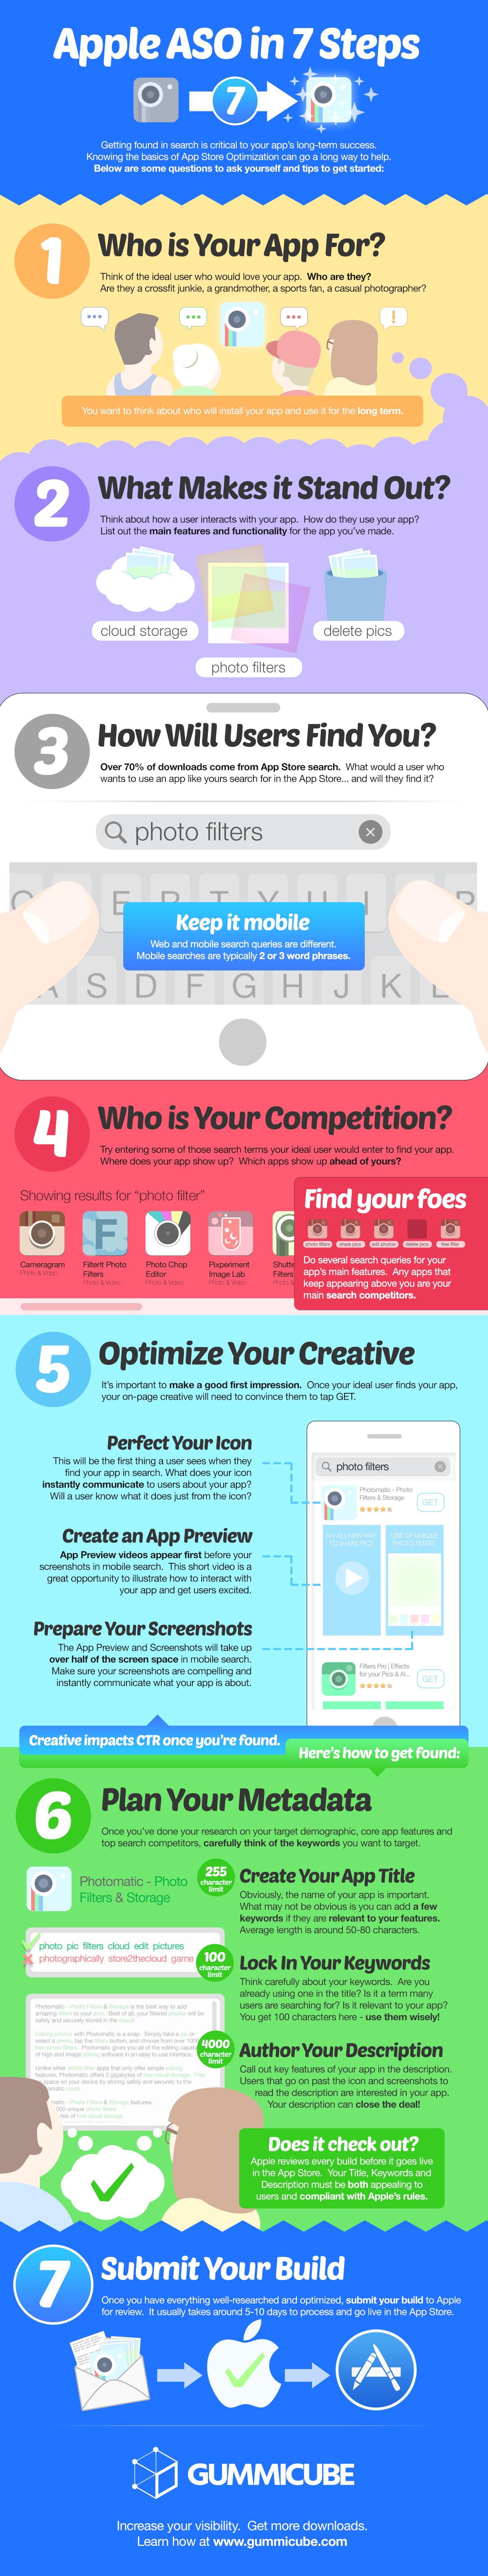 1 App Store Optimization Aso Company Best Mobile App Marketing Services App Marketing Infographic Optimization